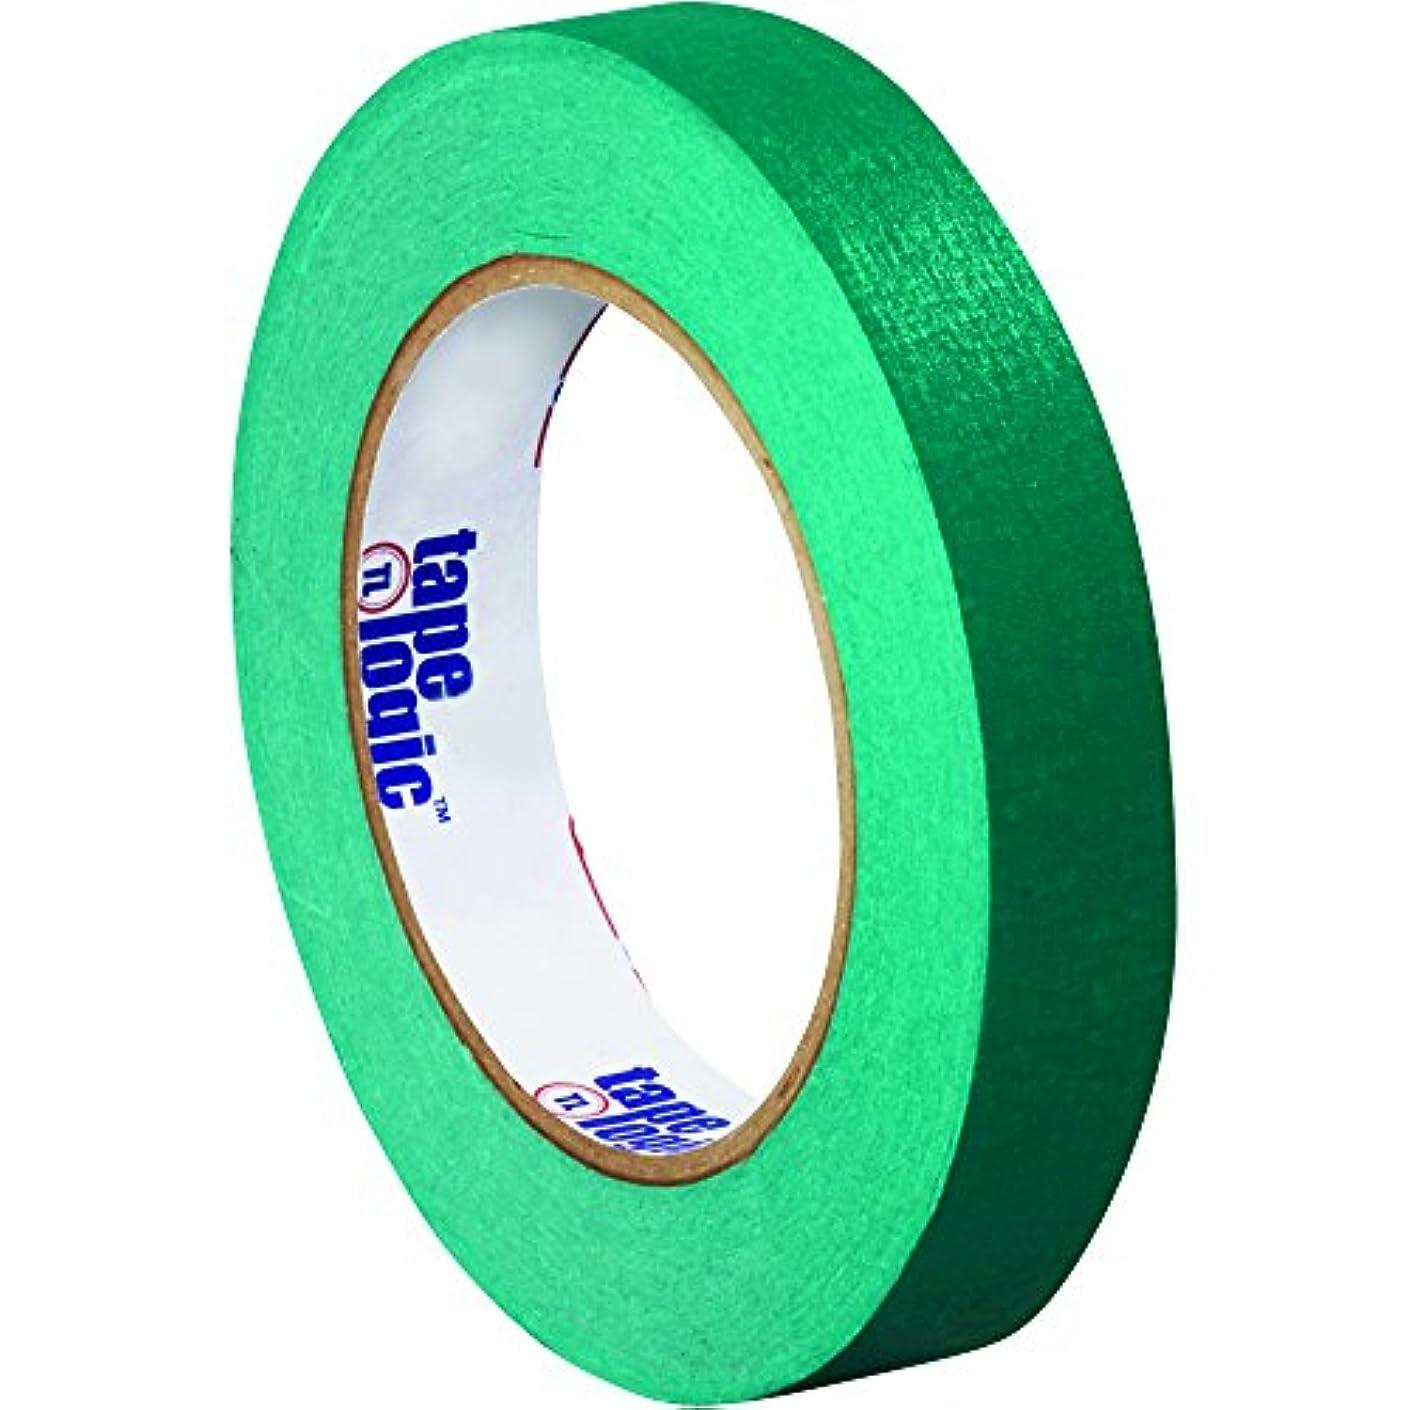 Partners Brand PT93400312PKE Tape Logic Masking Tape, 3/4